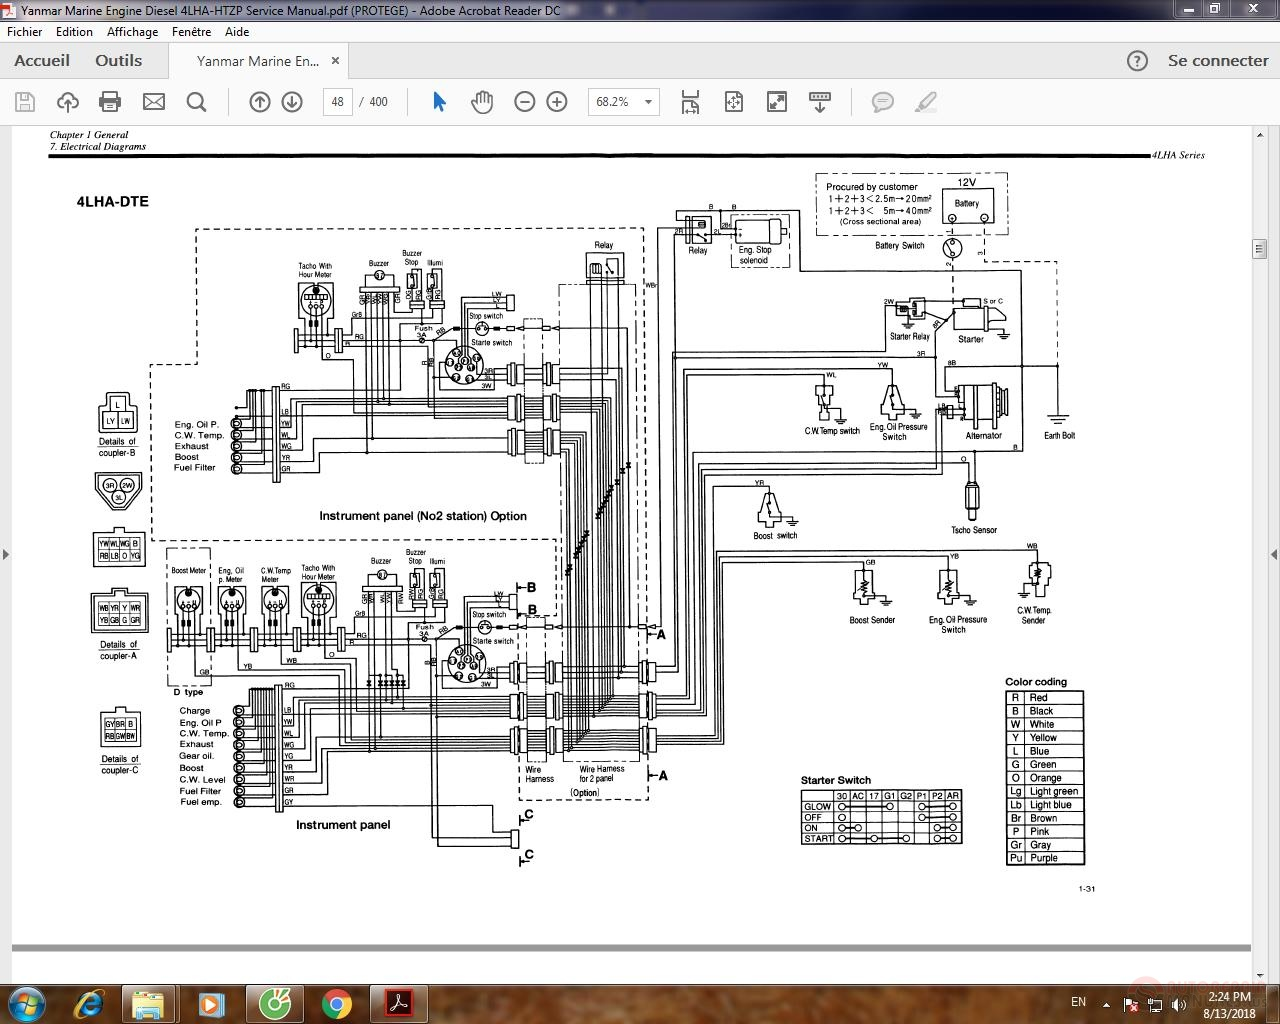 Yanmar Marine Engine Diesel 4LHA-HTZP Service Manual | Auto